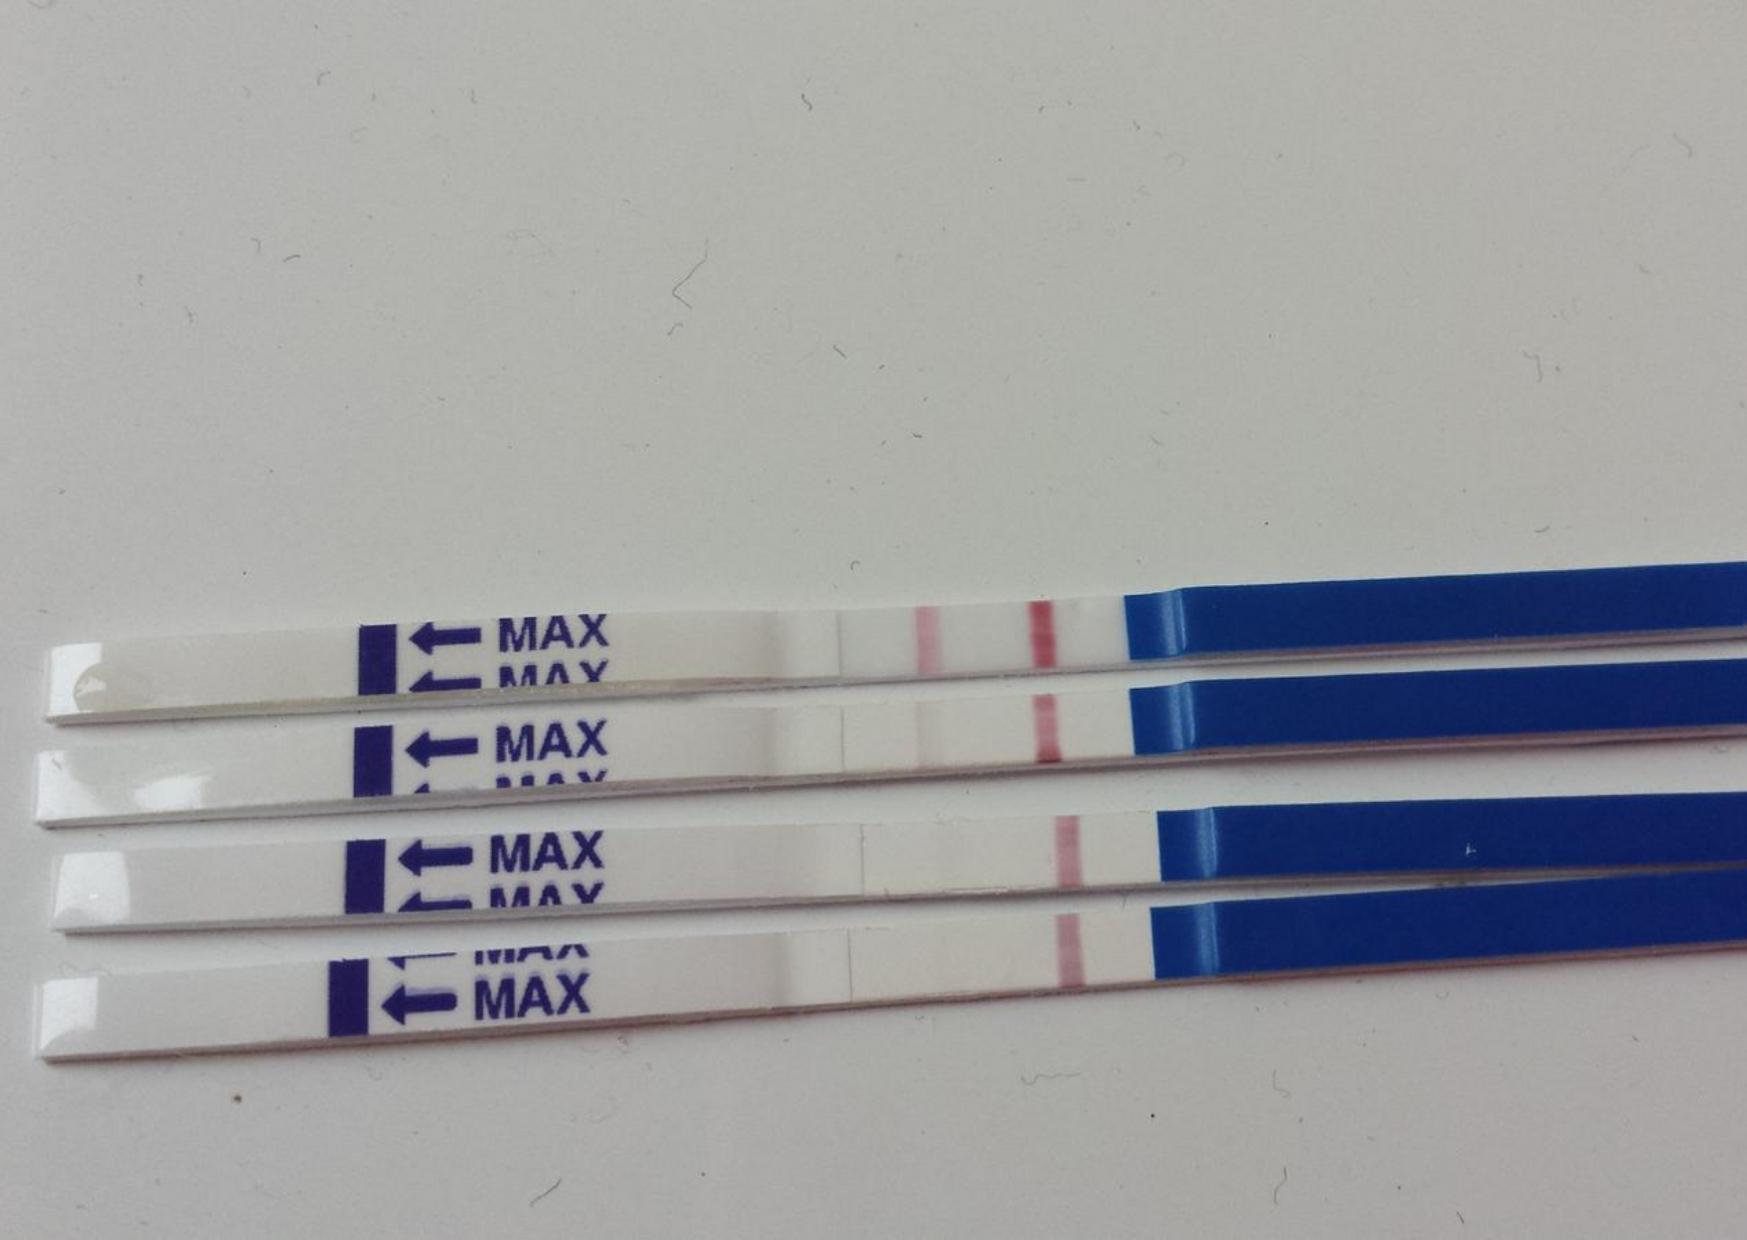 duch na těhotenském testu